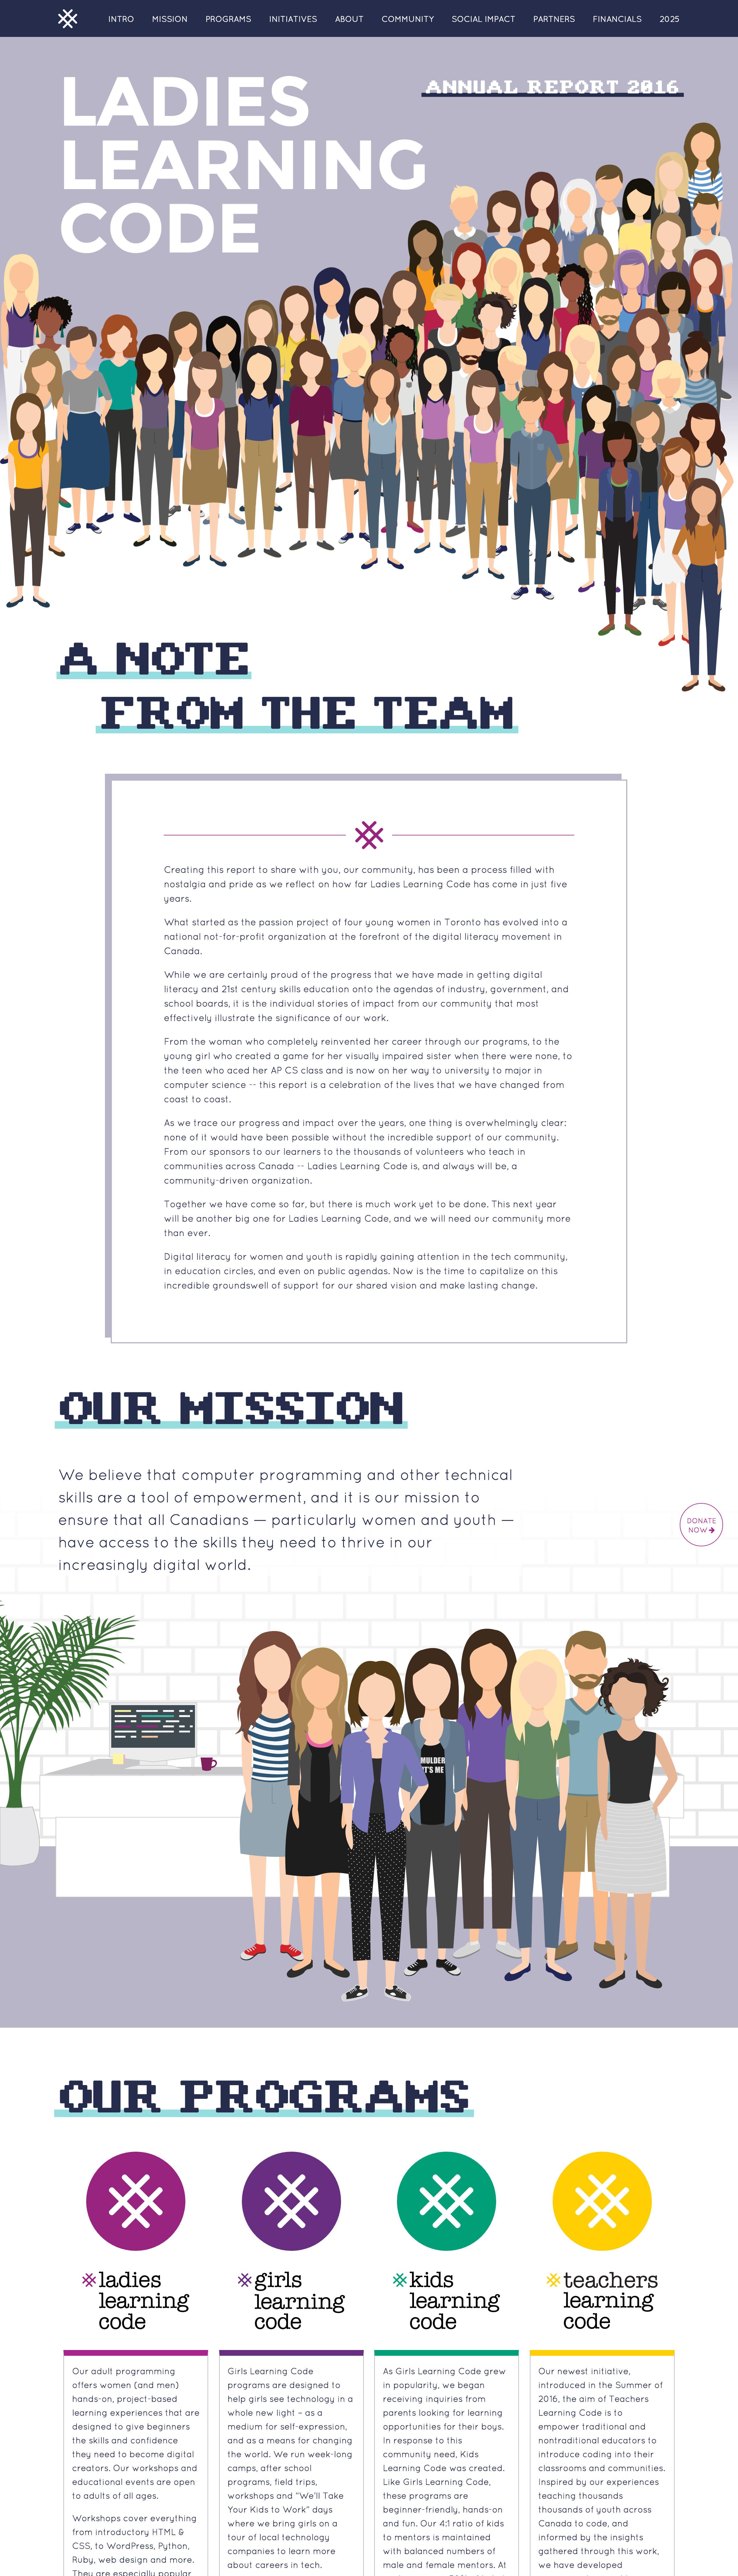 Ladies Learning Code Annual Report Website Screenshot